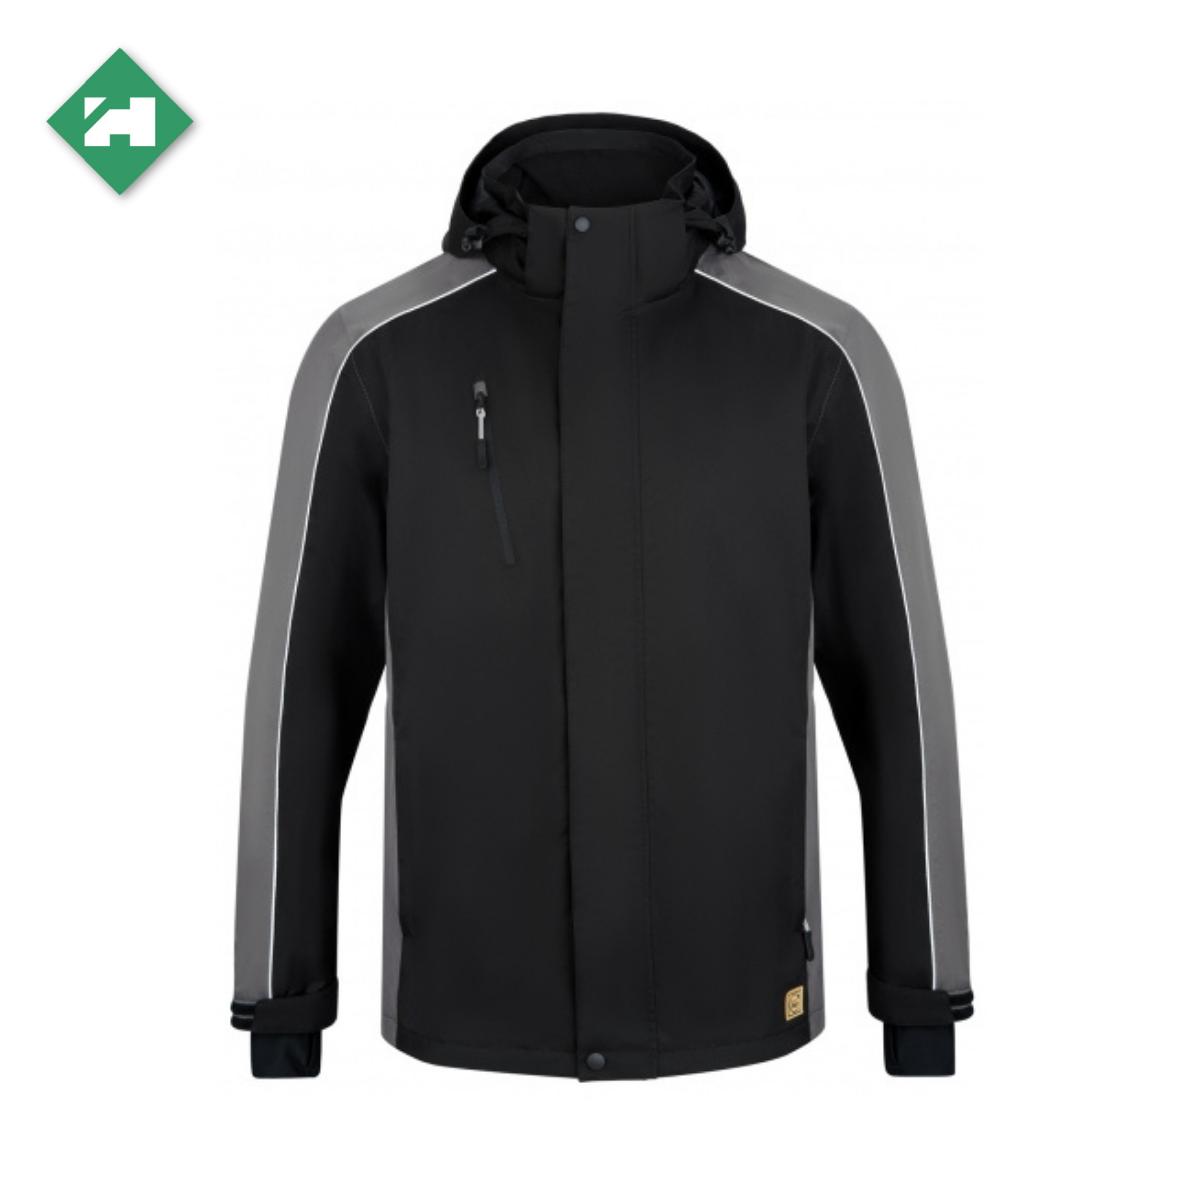 JK4688_Avocet Earthpro Recycled Jacket